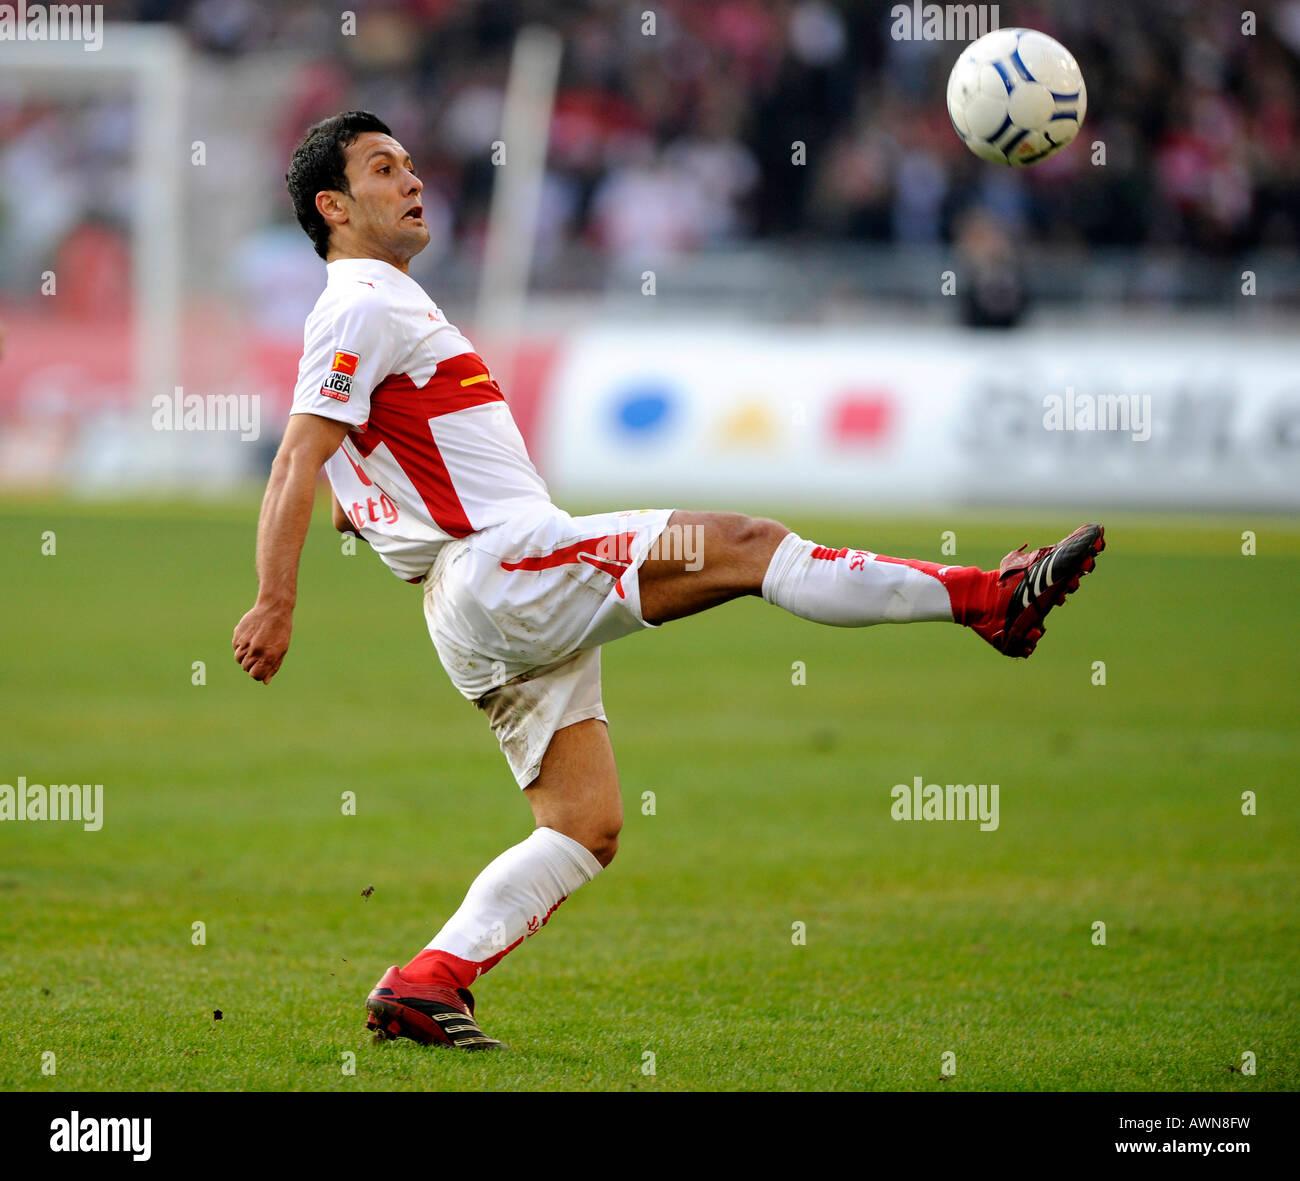 Yildiray BASTUeRK VfB Stuttgart - Stock Image